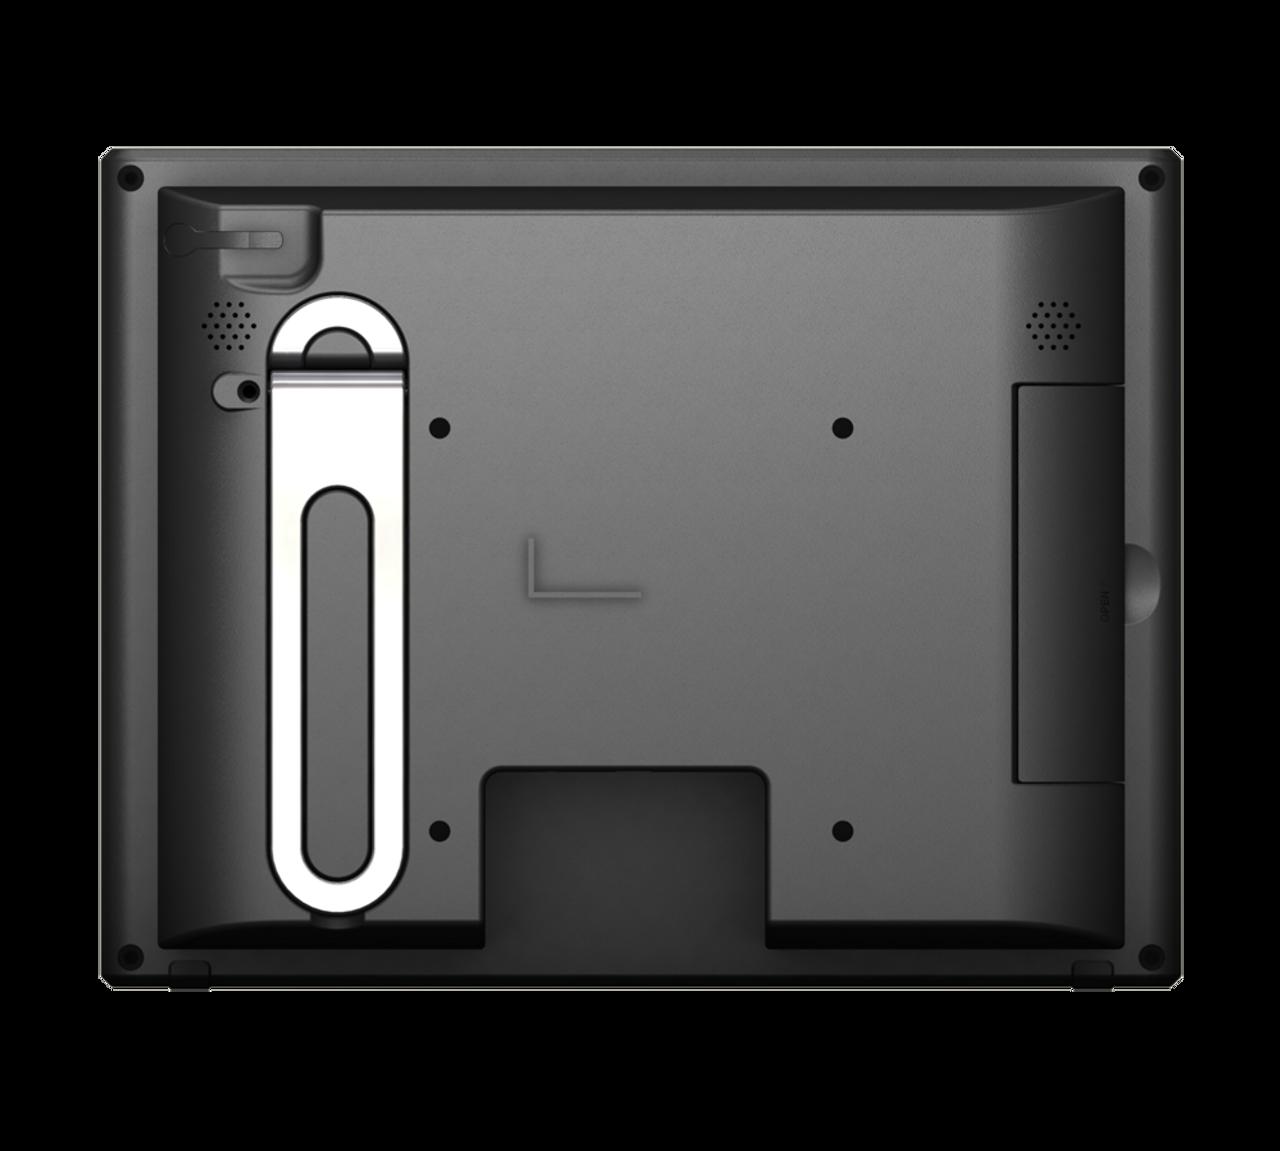 UM-82/C/T (USB Touch Screen)